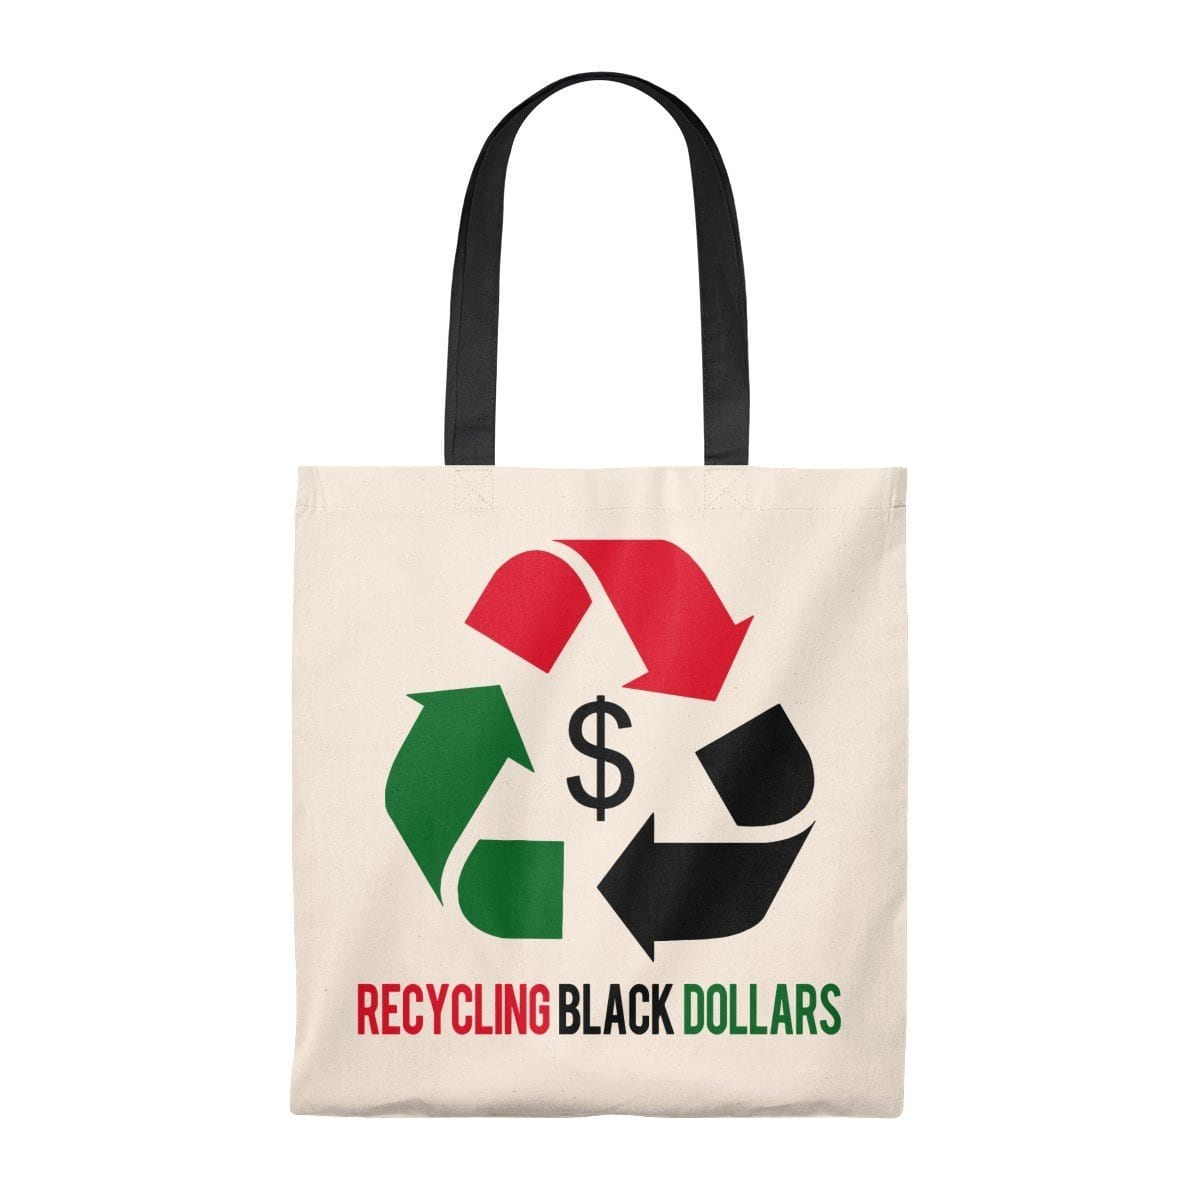 RECYCLING BLACK DOLLARS TOTE BAG - Melanin Apparel